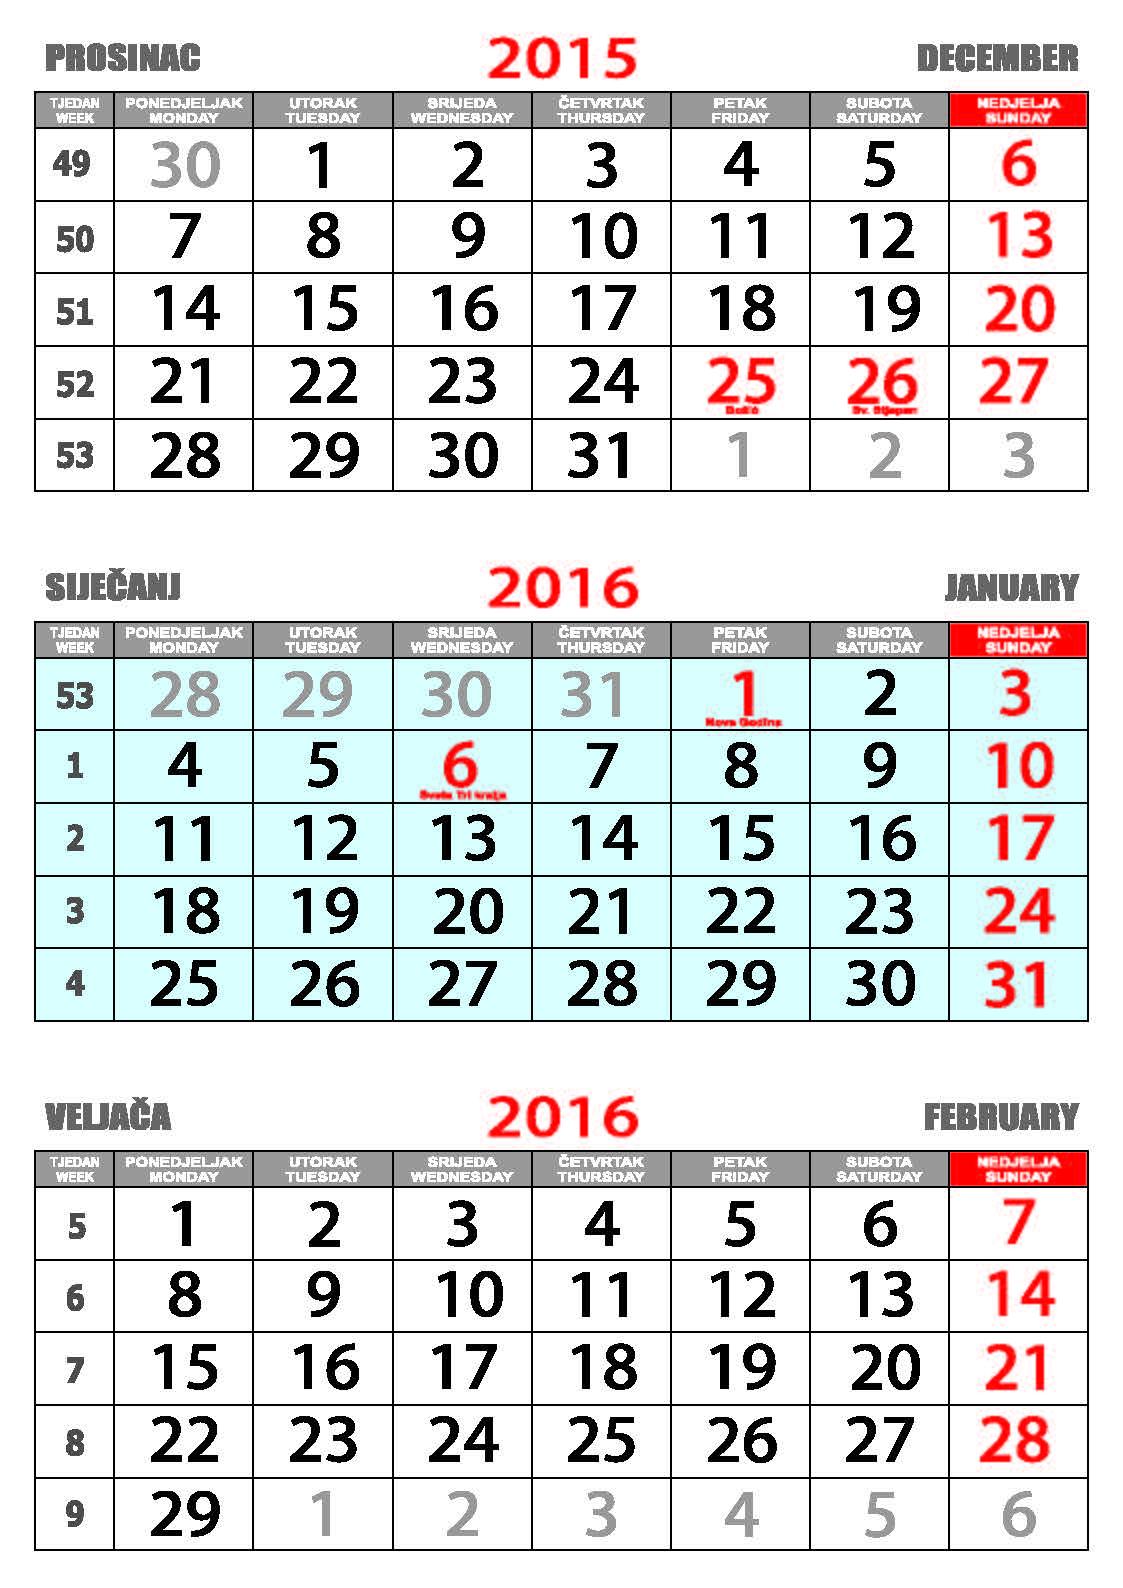 Nekategorizirano Tisak na kalendare Trodijelni poslovni kalendar